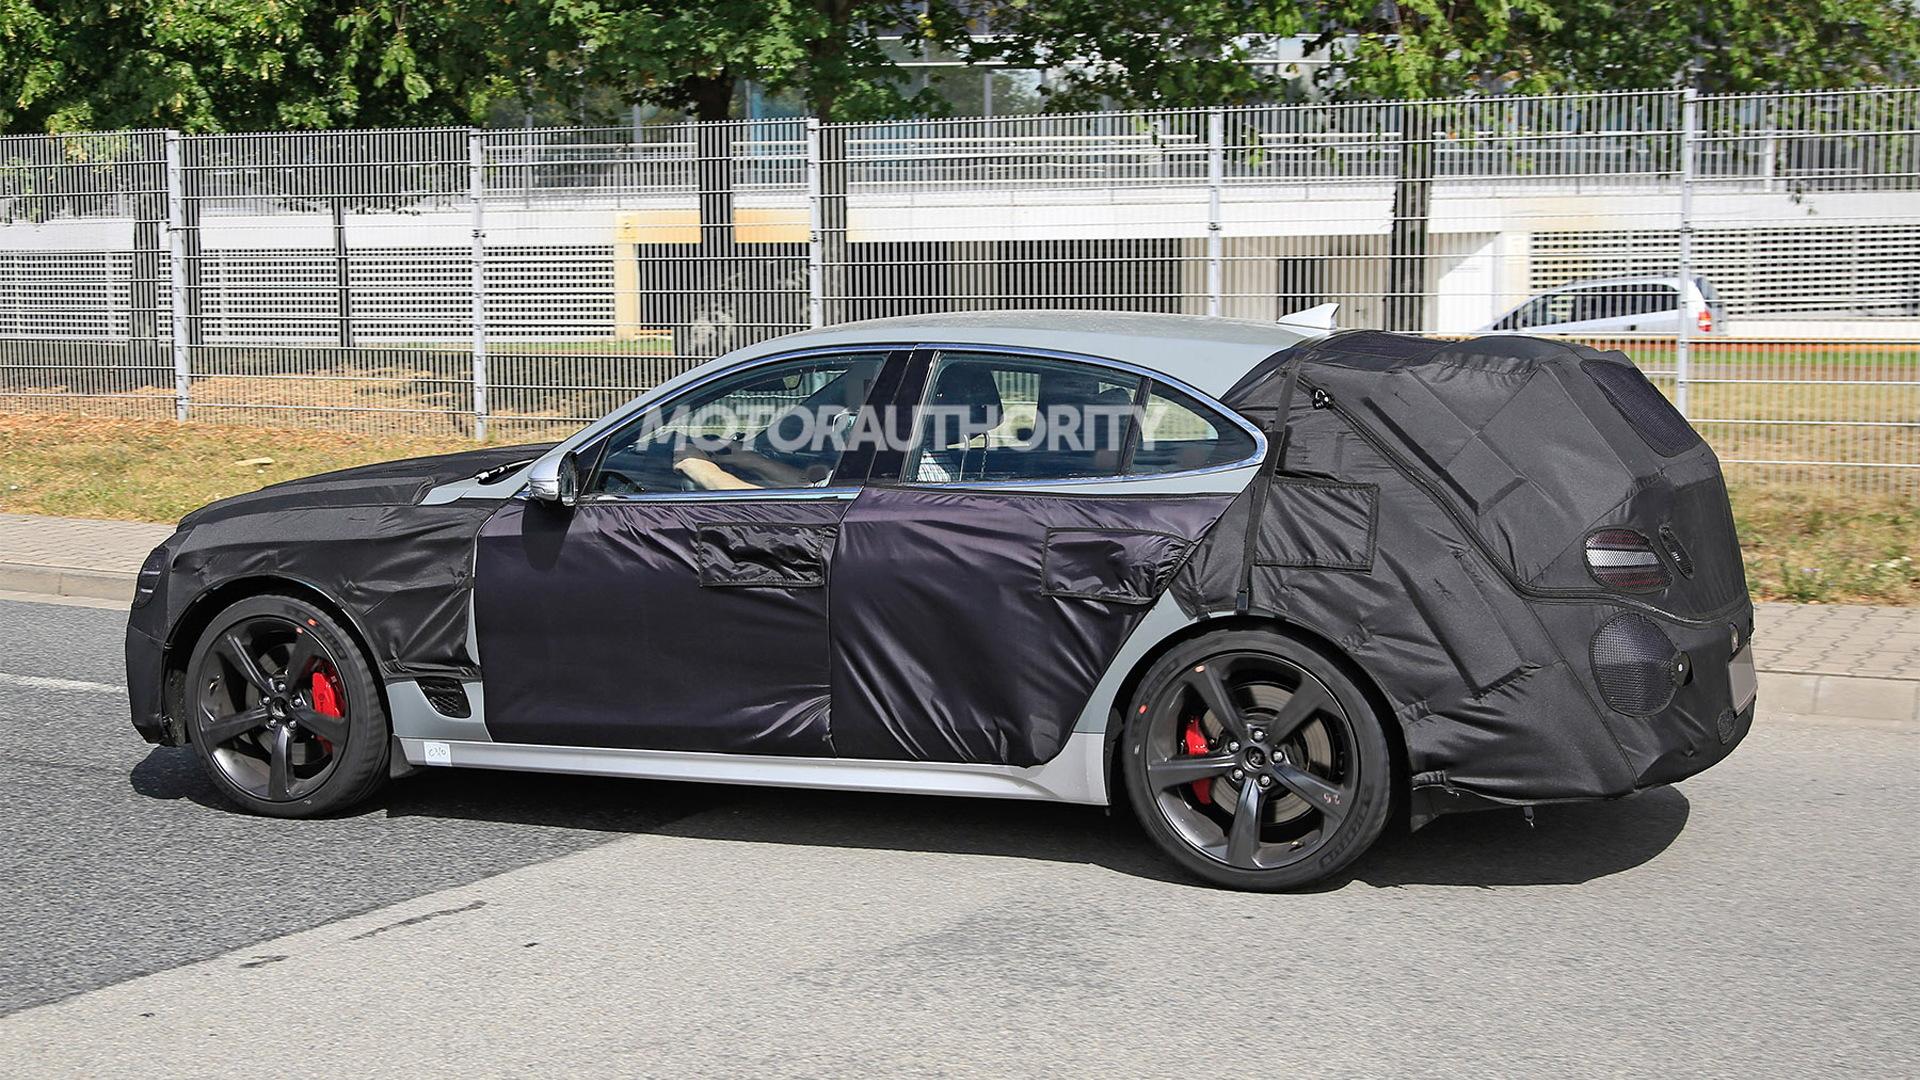 2022 Genesis G70 wagon spy shots - Photo credit:S. Baldauf/SB-Medien